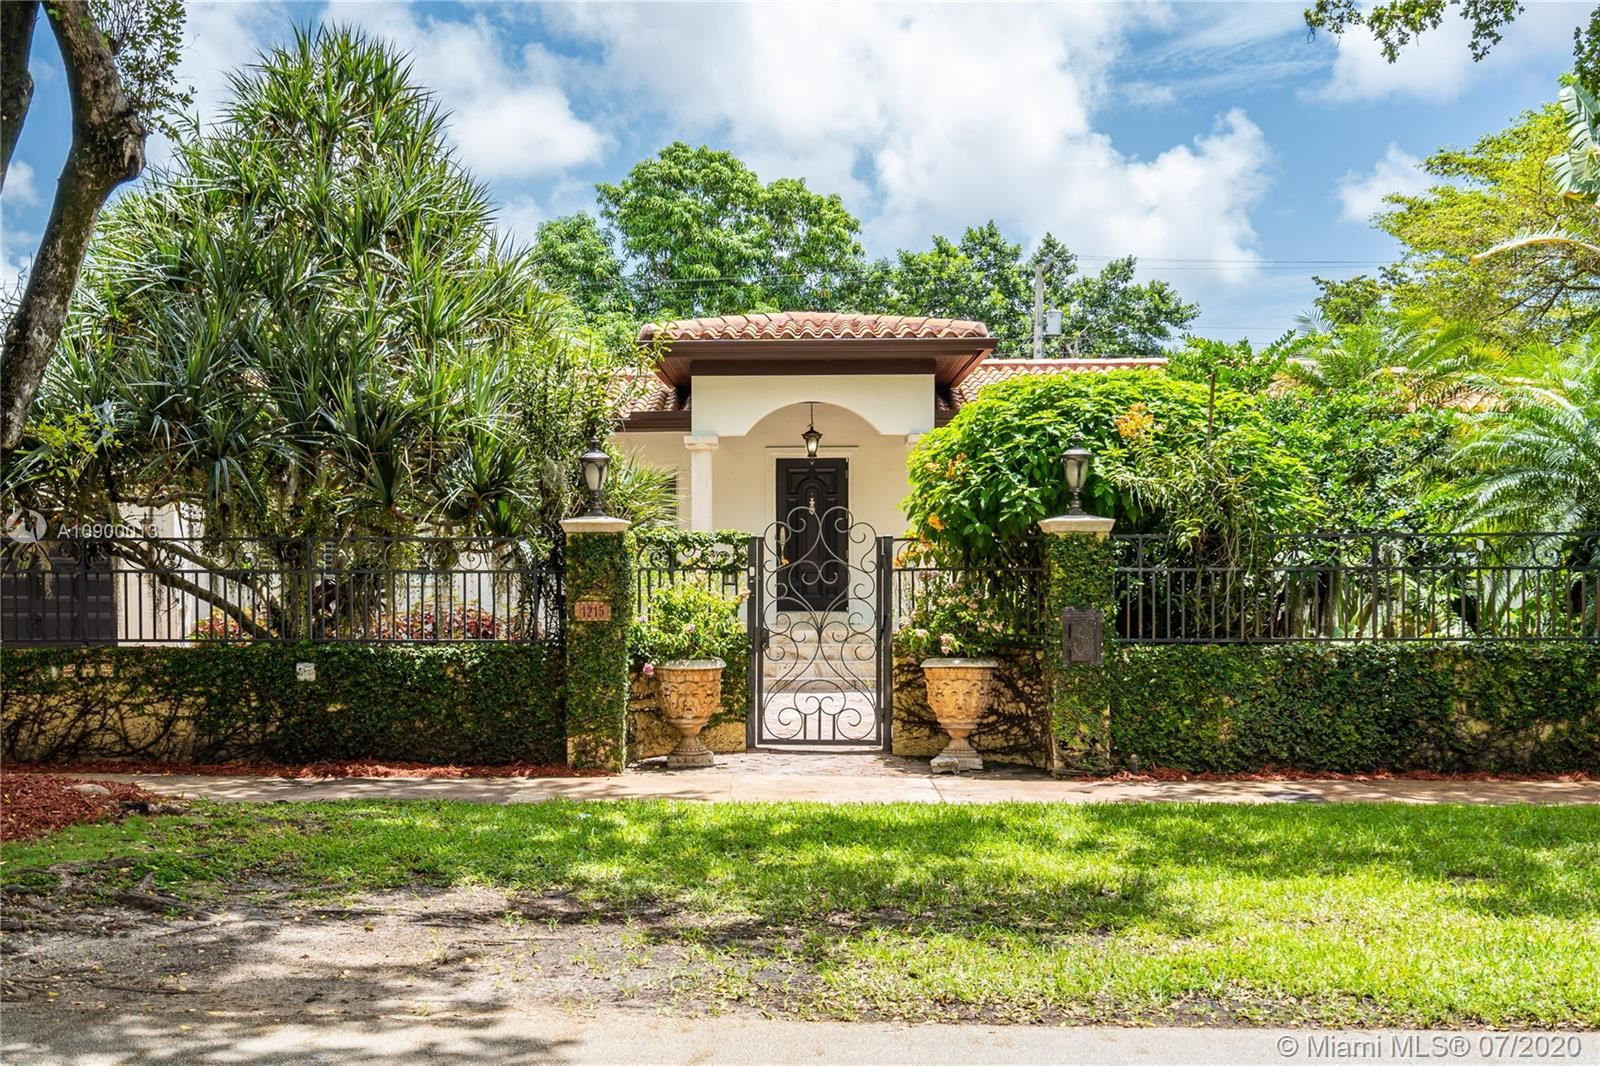 1215 Ferdinand St, Coral Gables, FL 33134 - #: A10900013